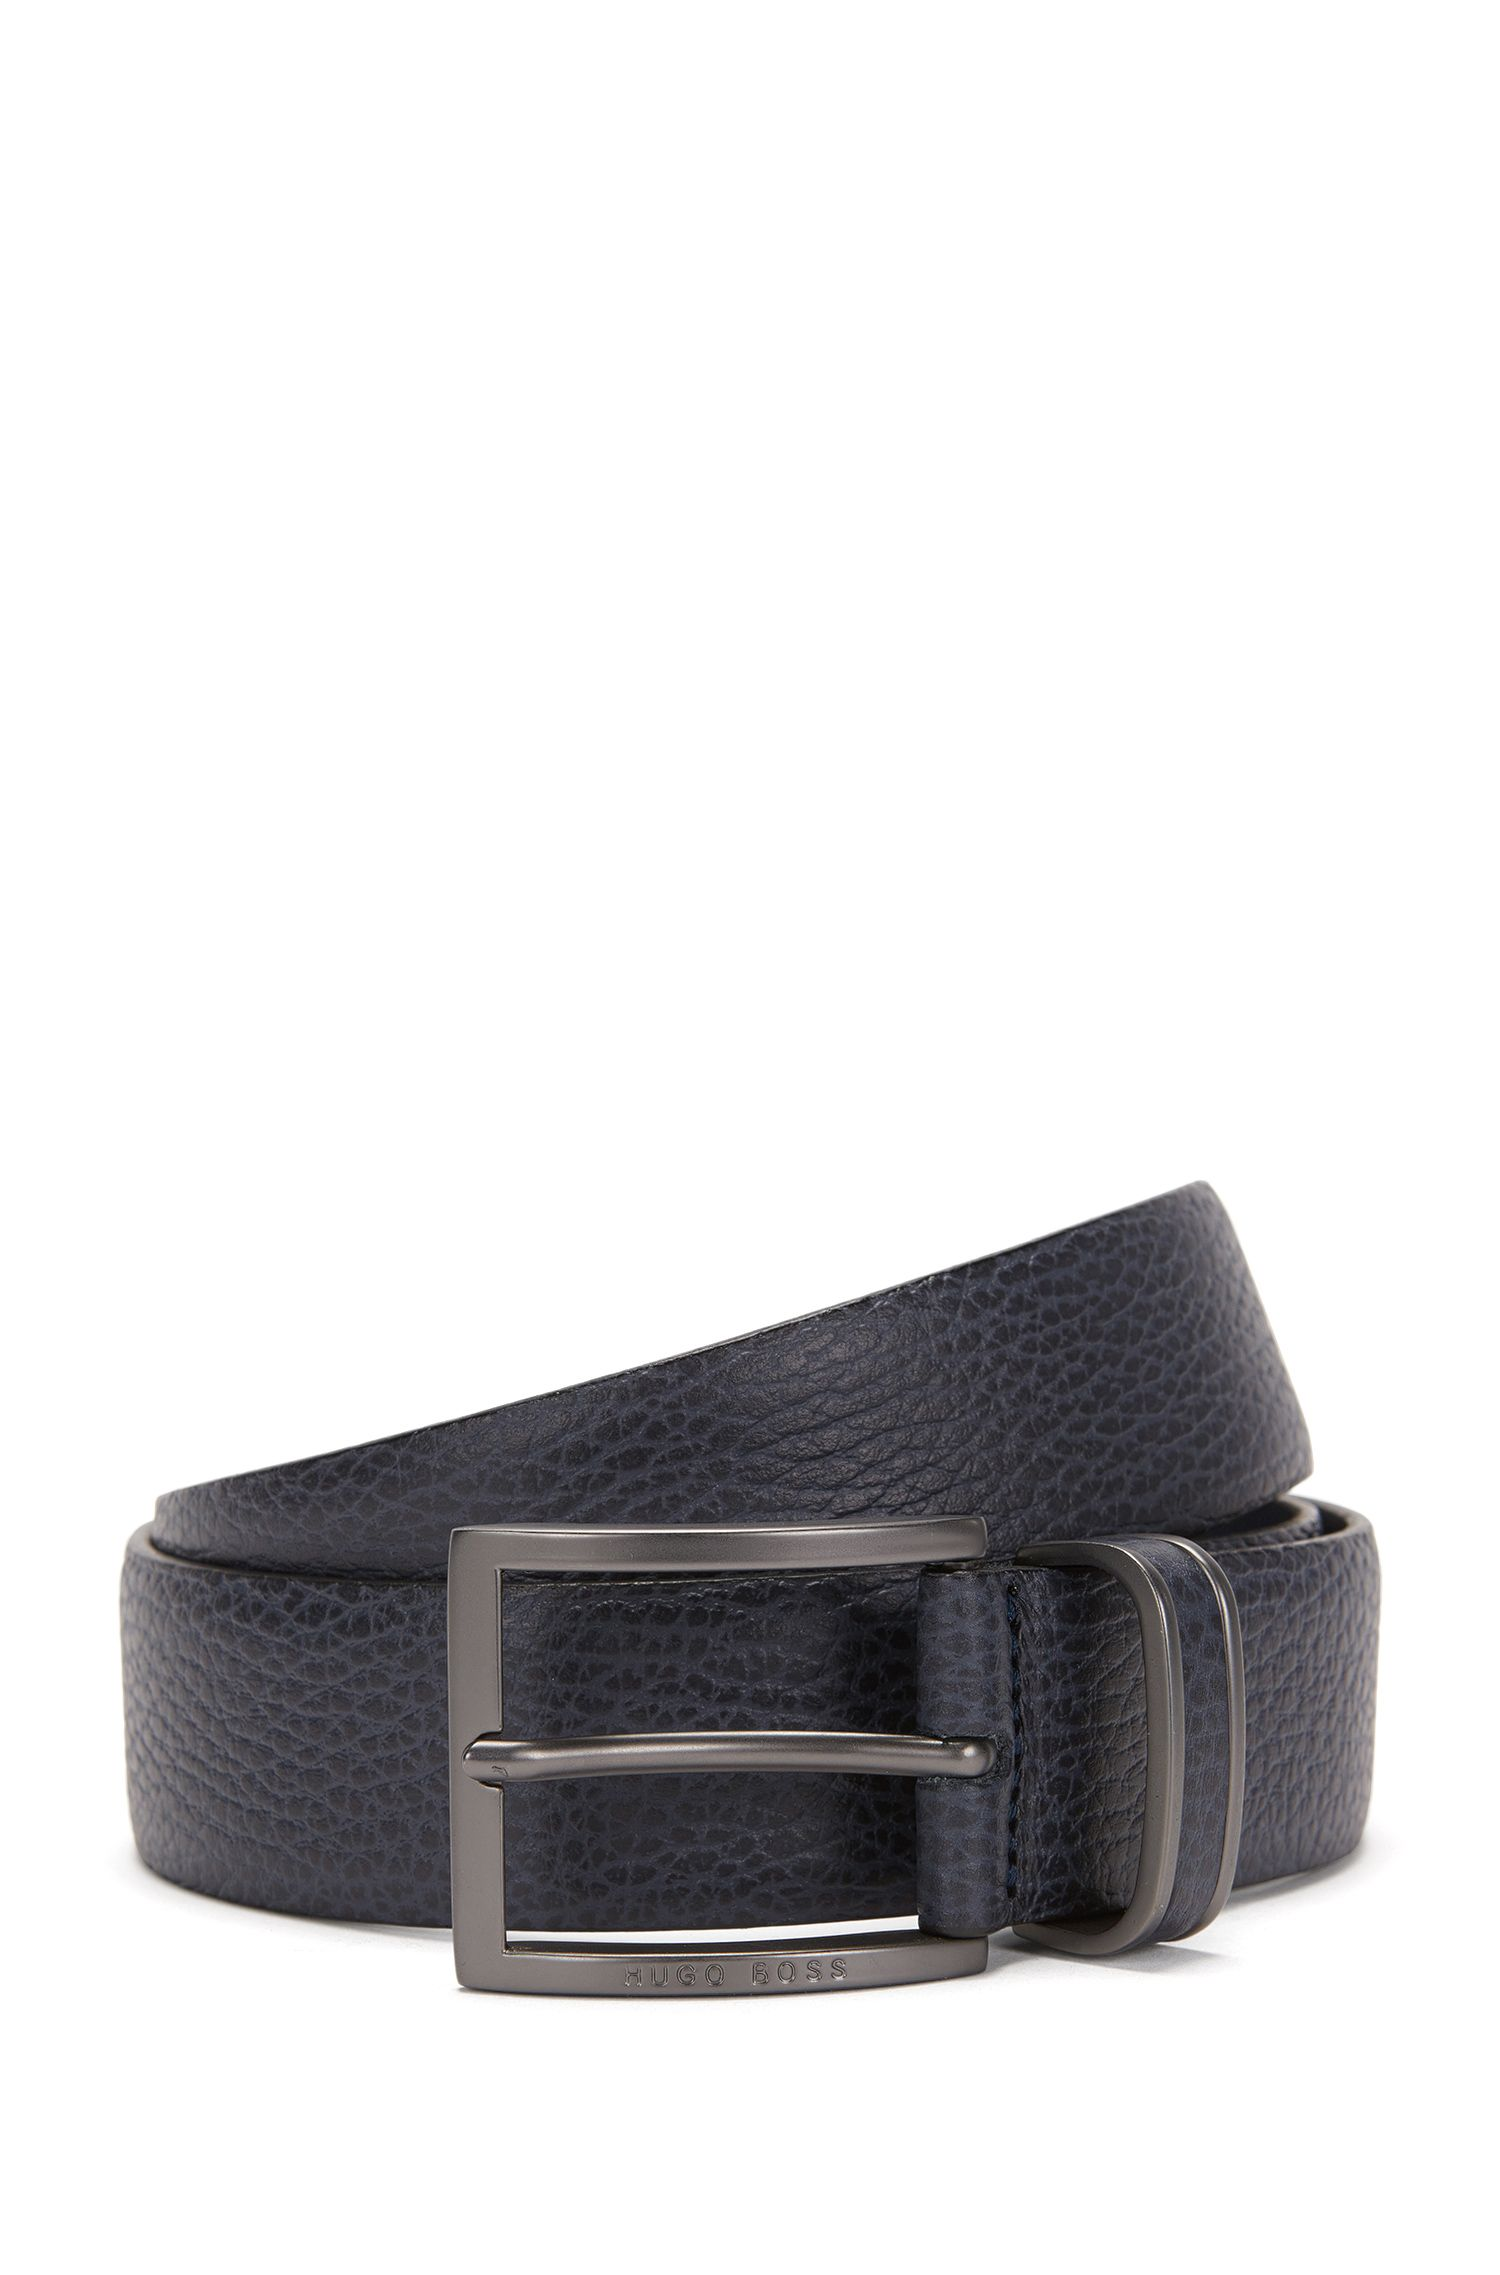 Gürtel aus geprägtem Leder mit verstärkter Schlaufe: 'Sopprin_Sz35_ltgr'